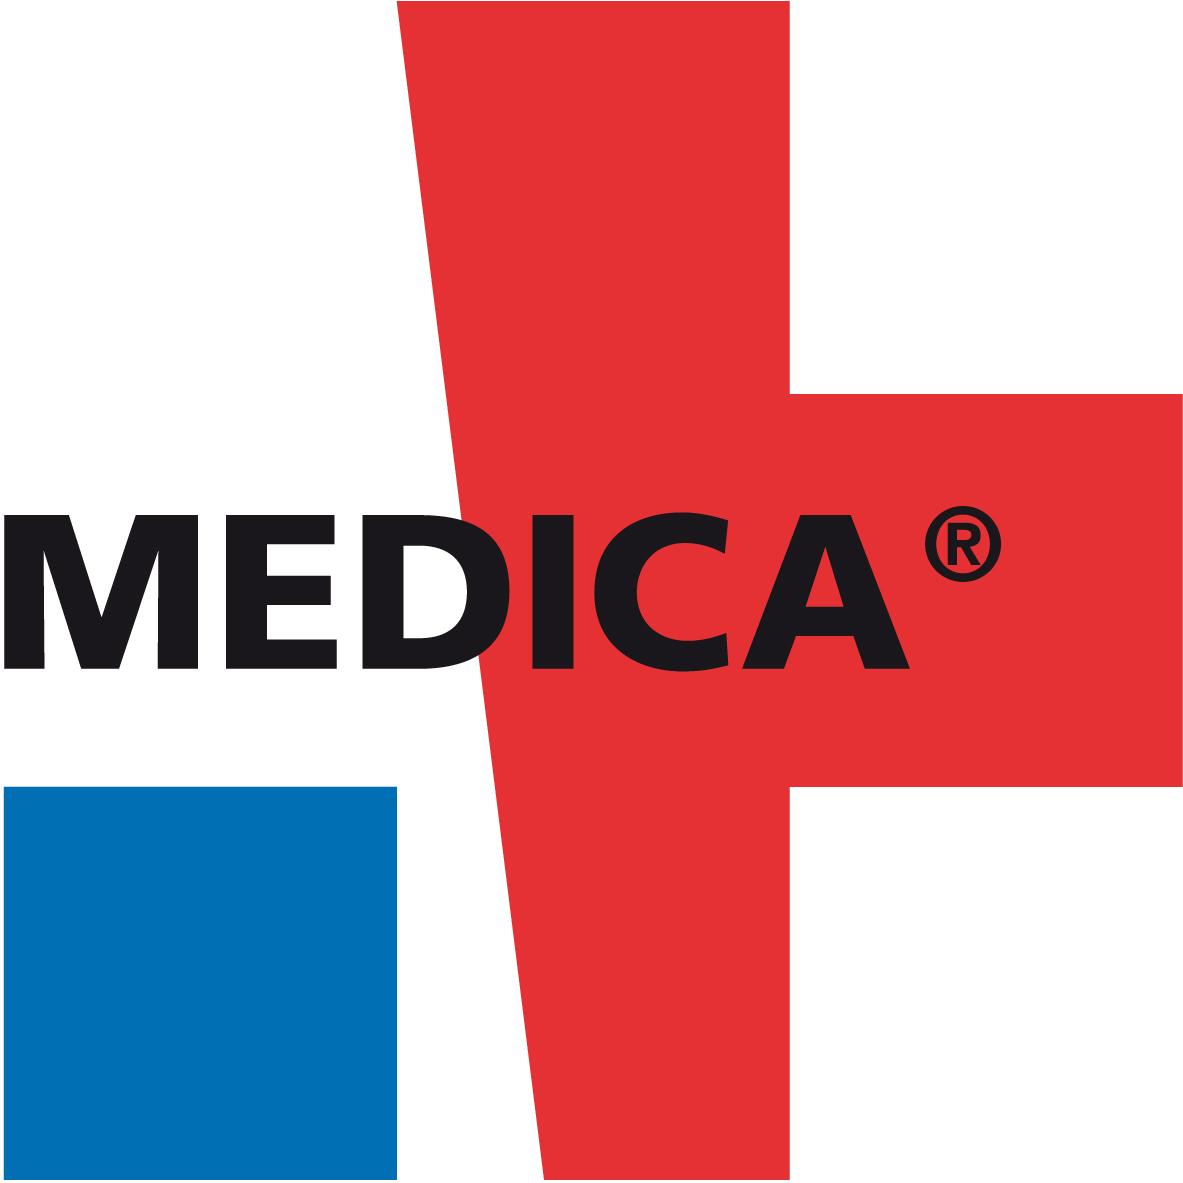 Medica Dusseldorf - Germany